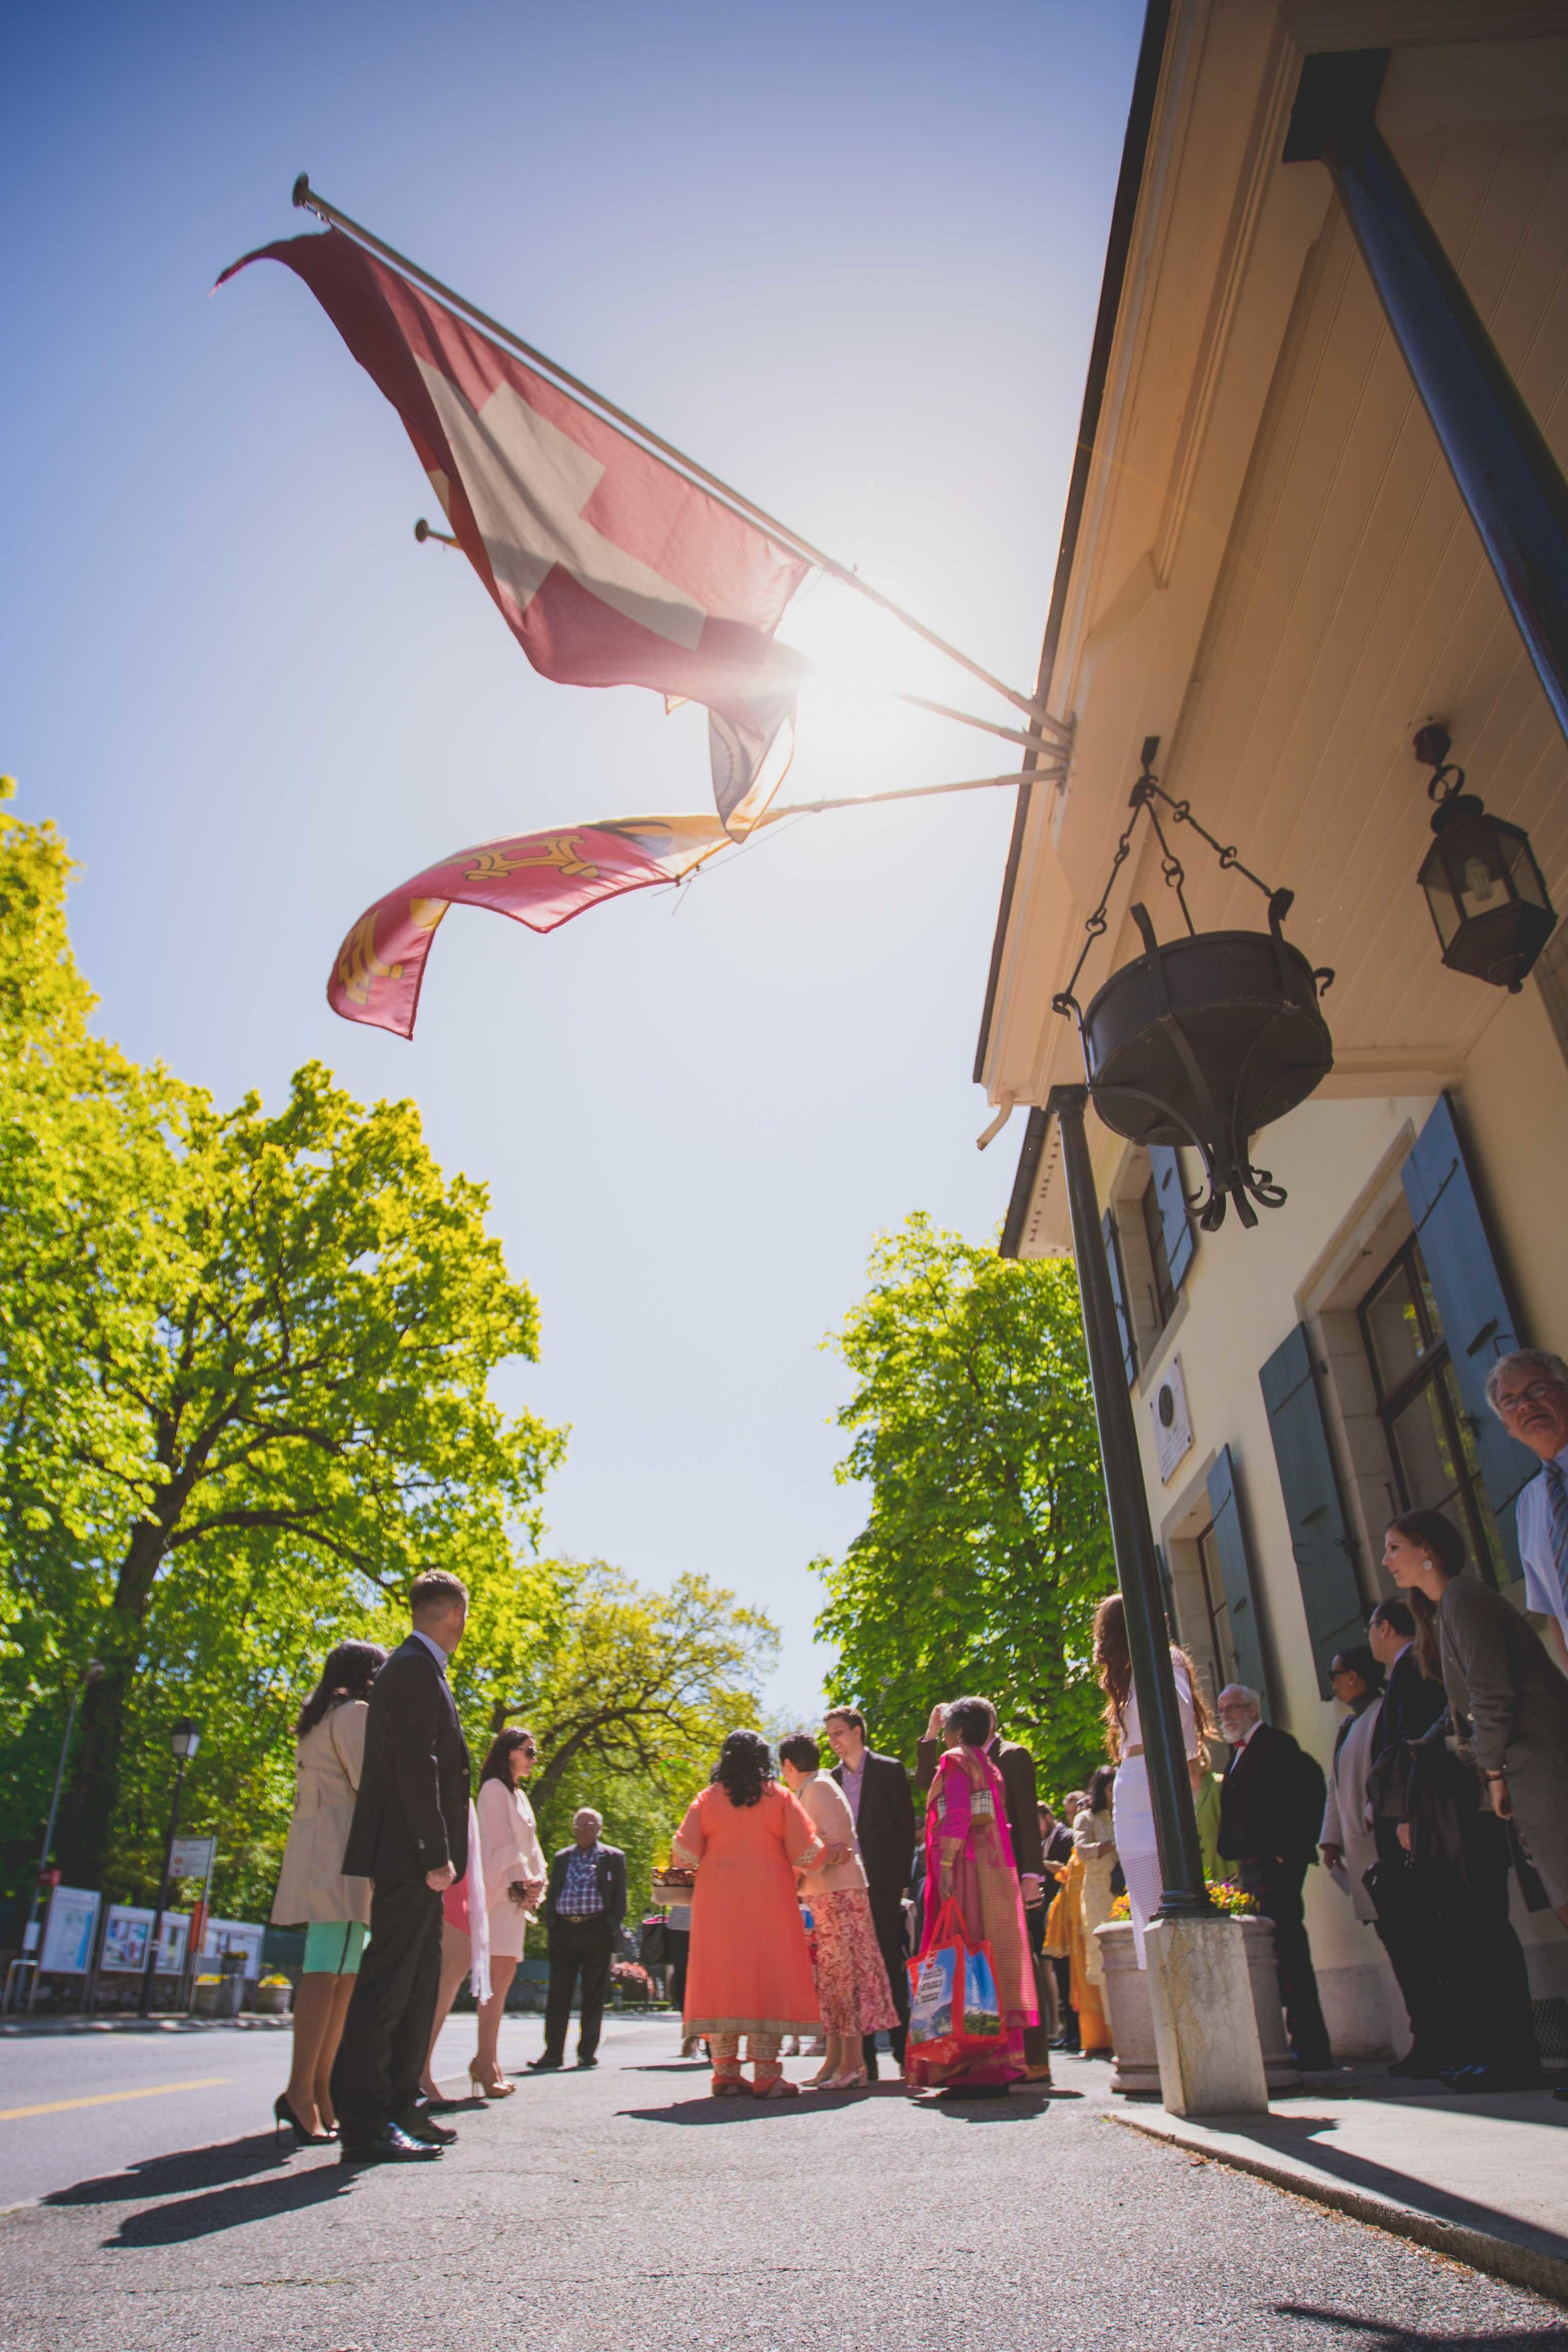 parc-des-eaux-vives-destination-wedding-photographer-geneva-switzerland-natalia-smith-photography-1.jpg